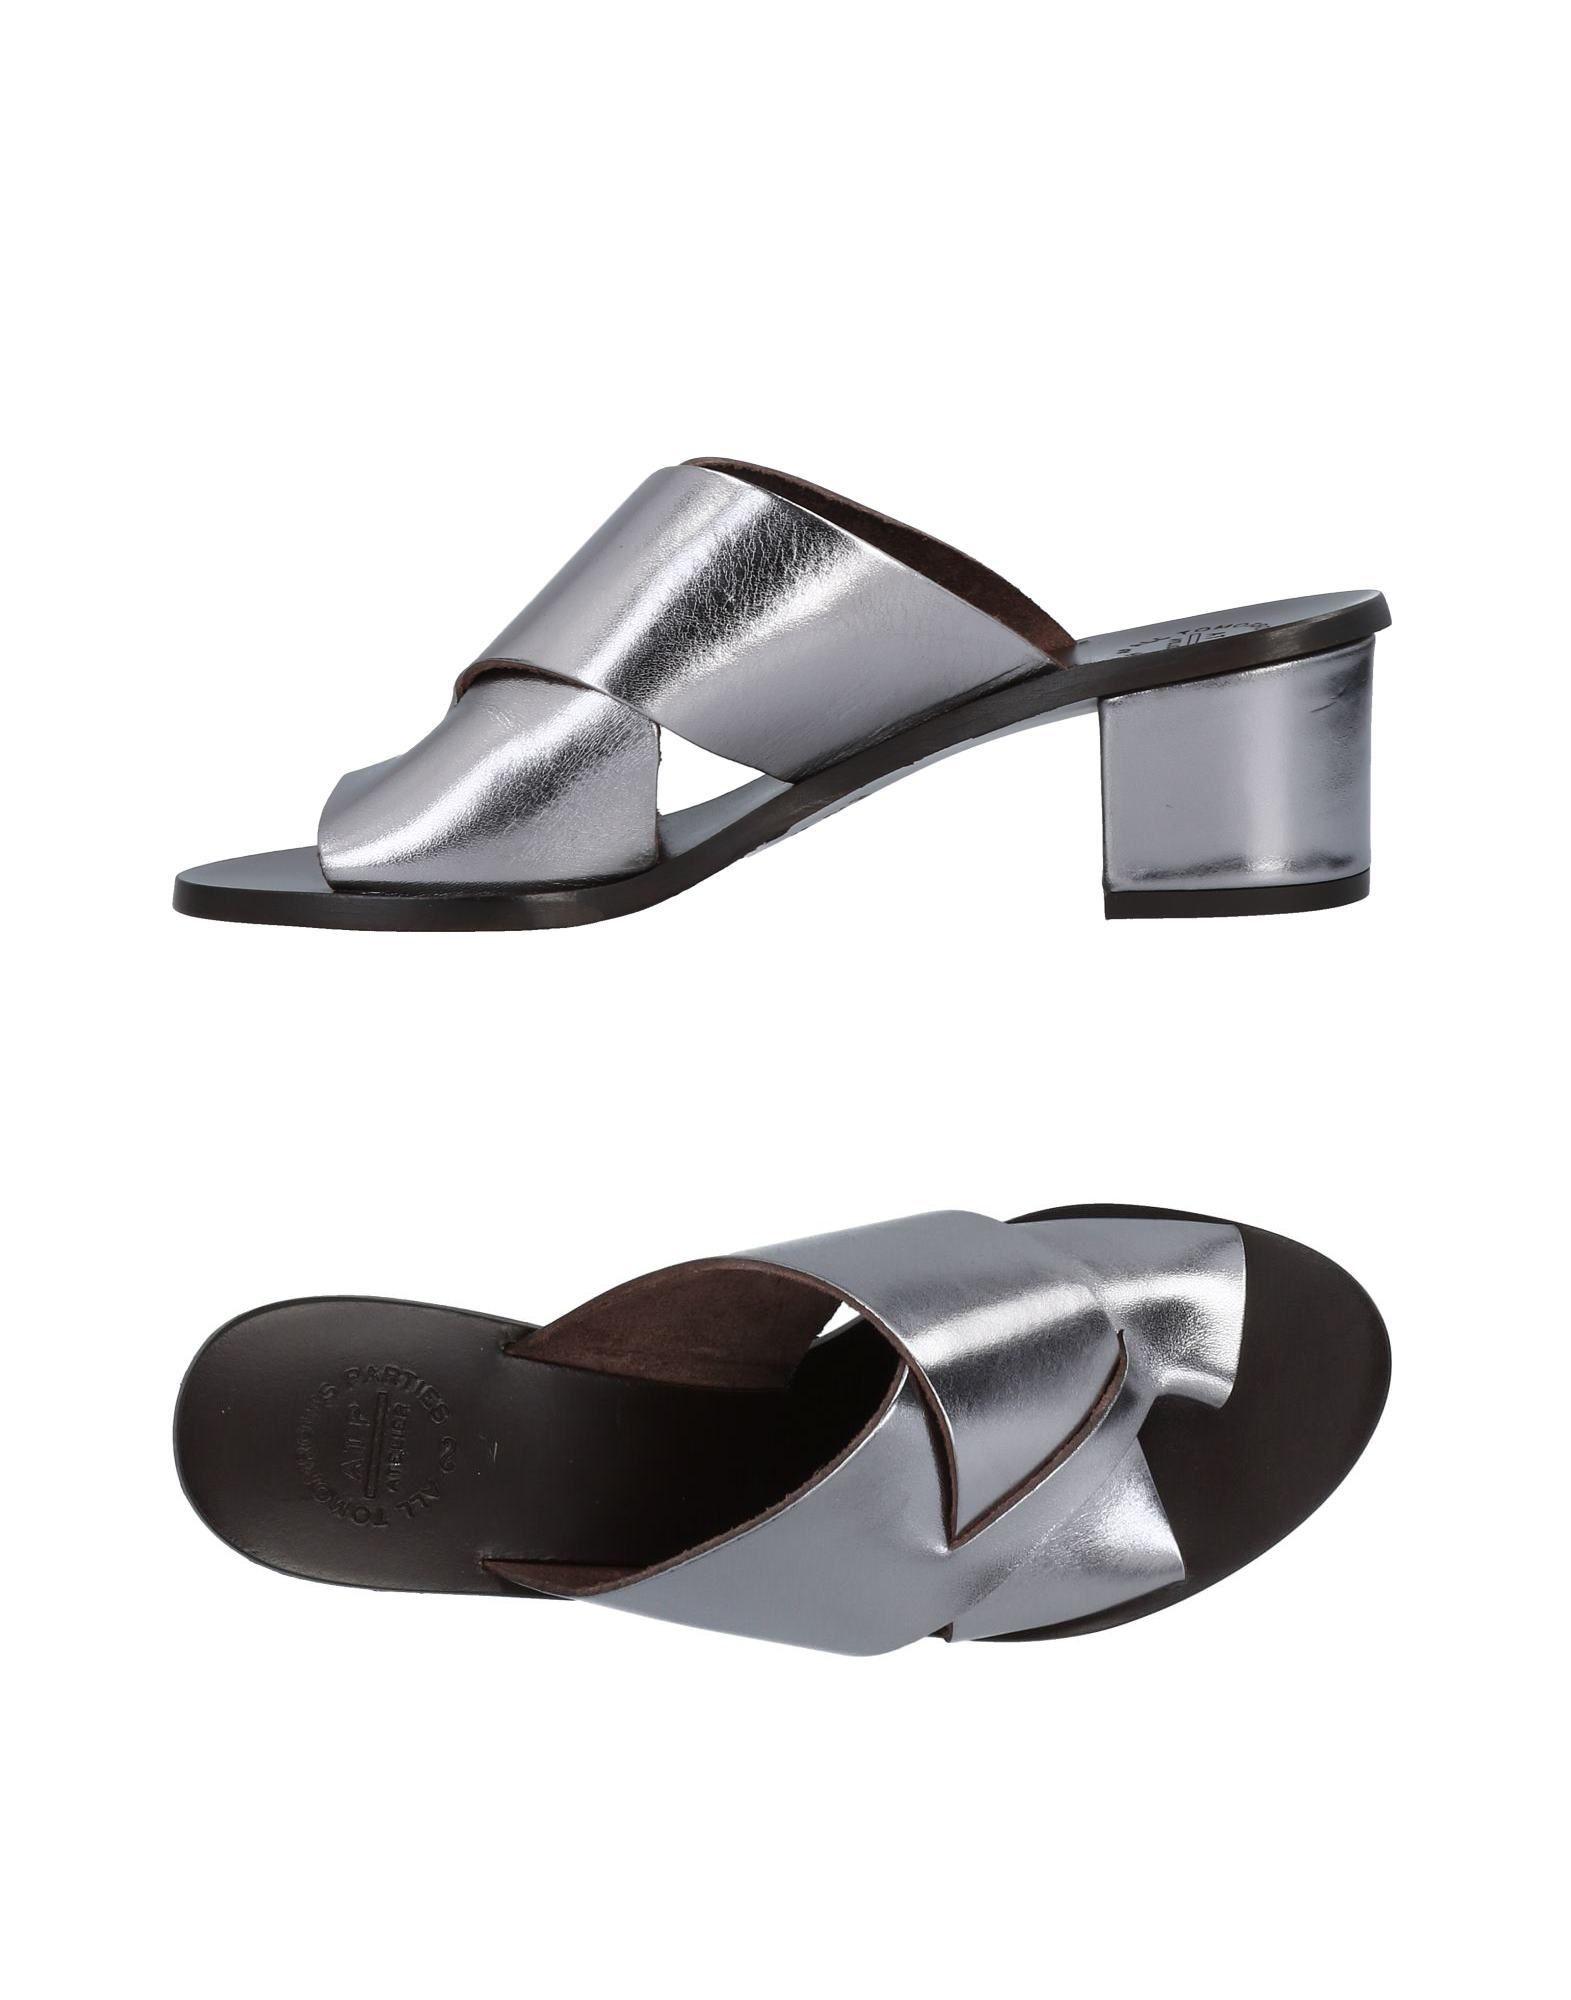 Atp Atp Atelier Sandals - Women Atp Atp Atelier Sandals online on  United Kingdom - 11493077LC 2d0eab